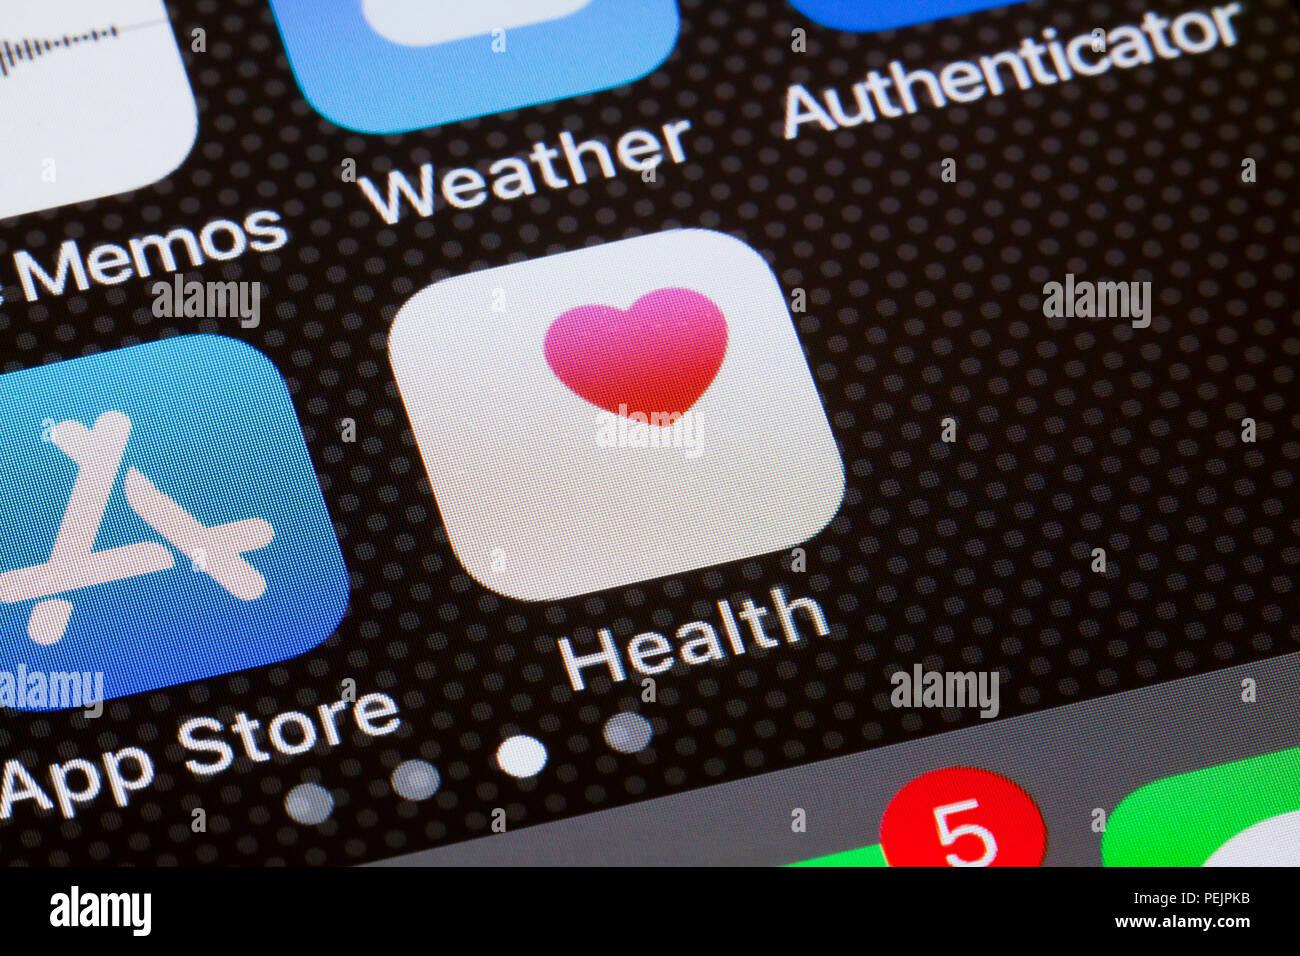 Health app icon on iPhone screen - USA - Stock Image